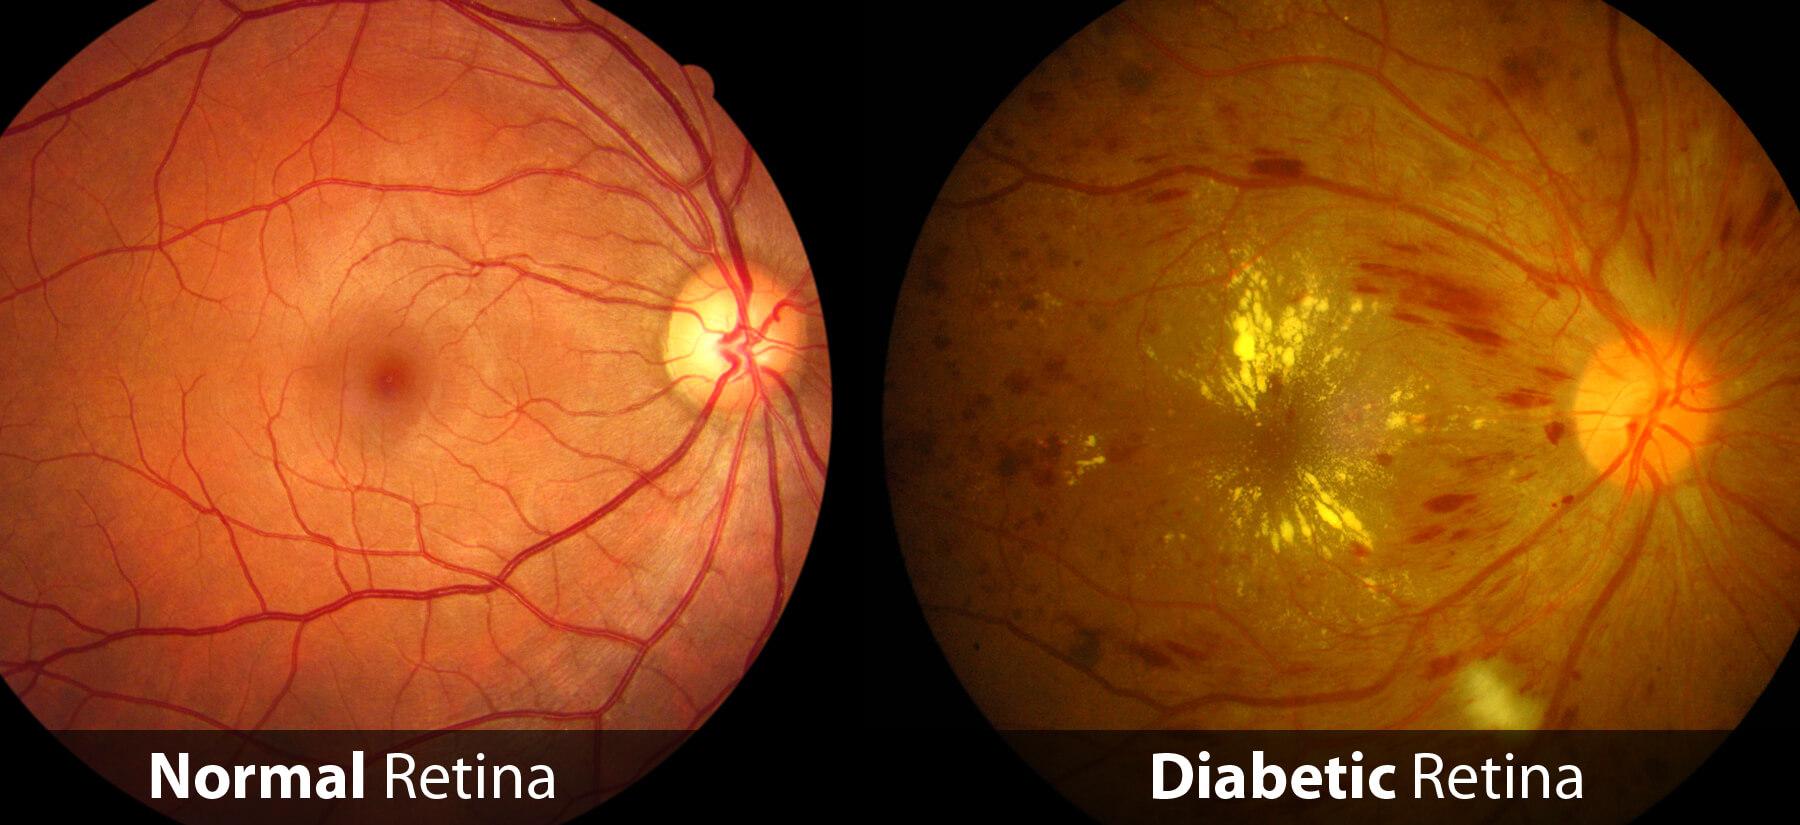 Diabetic Retinopathy Example